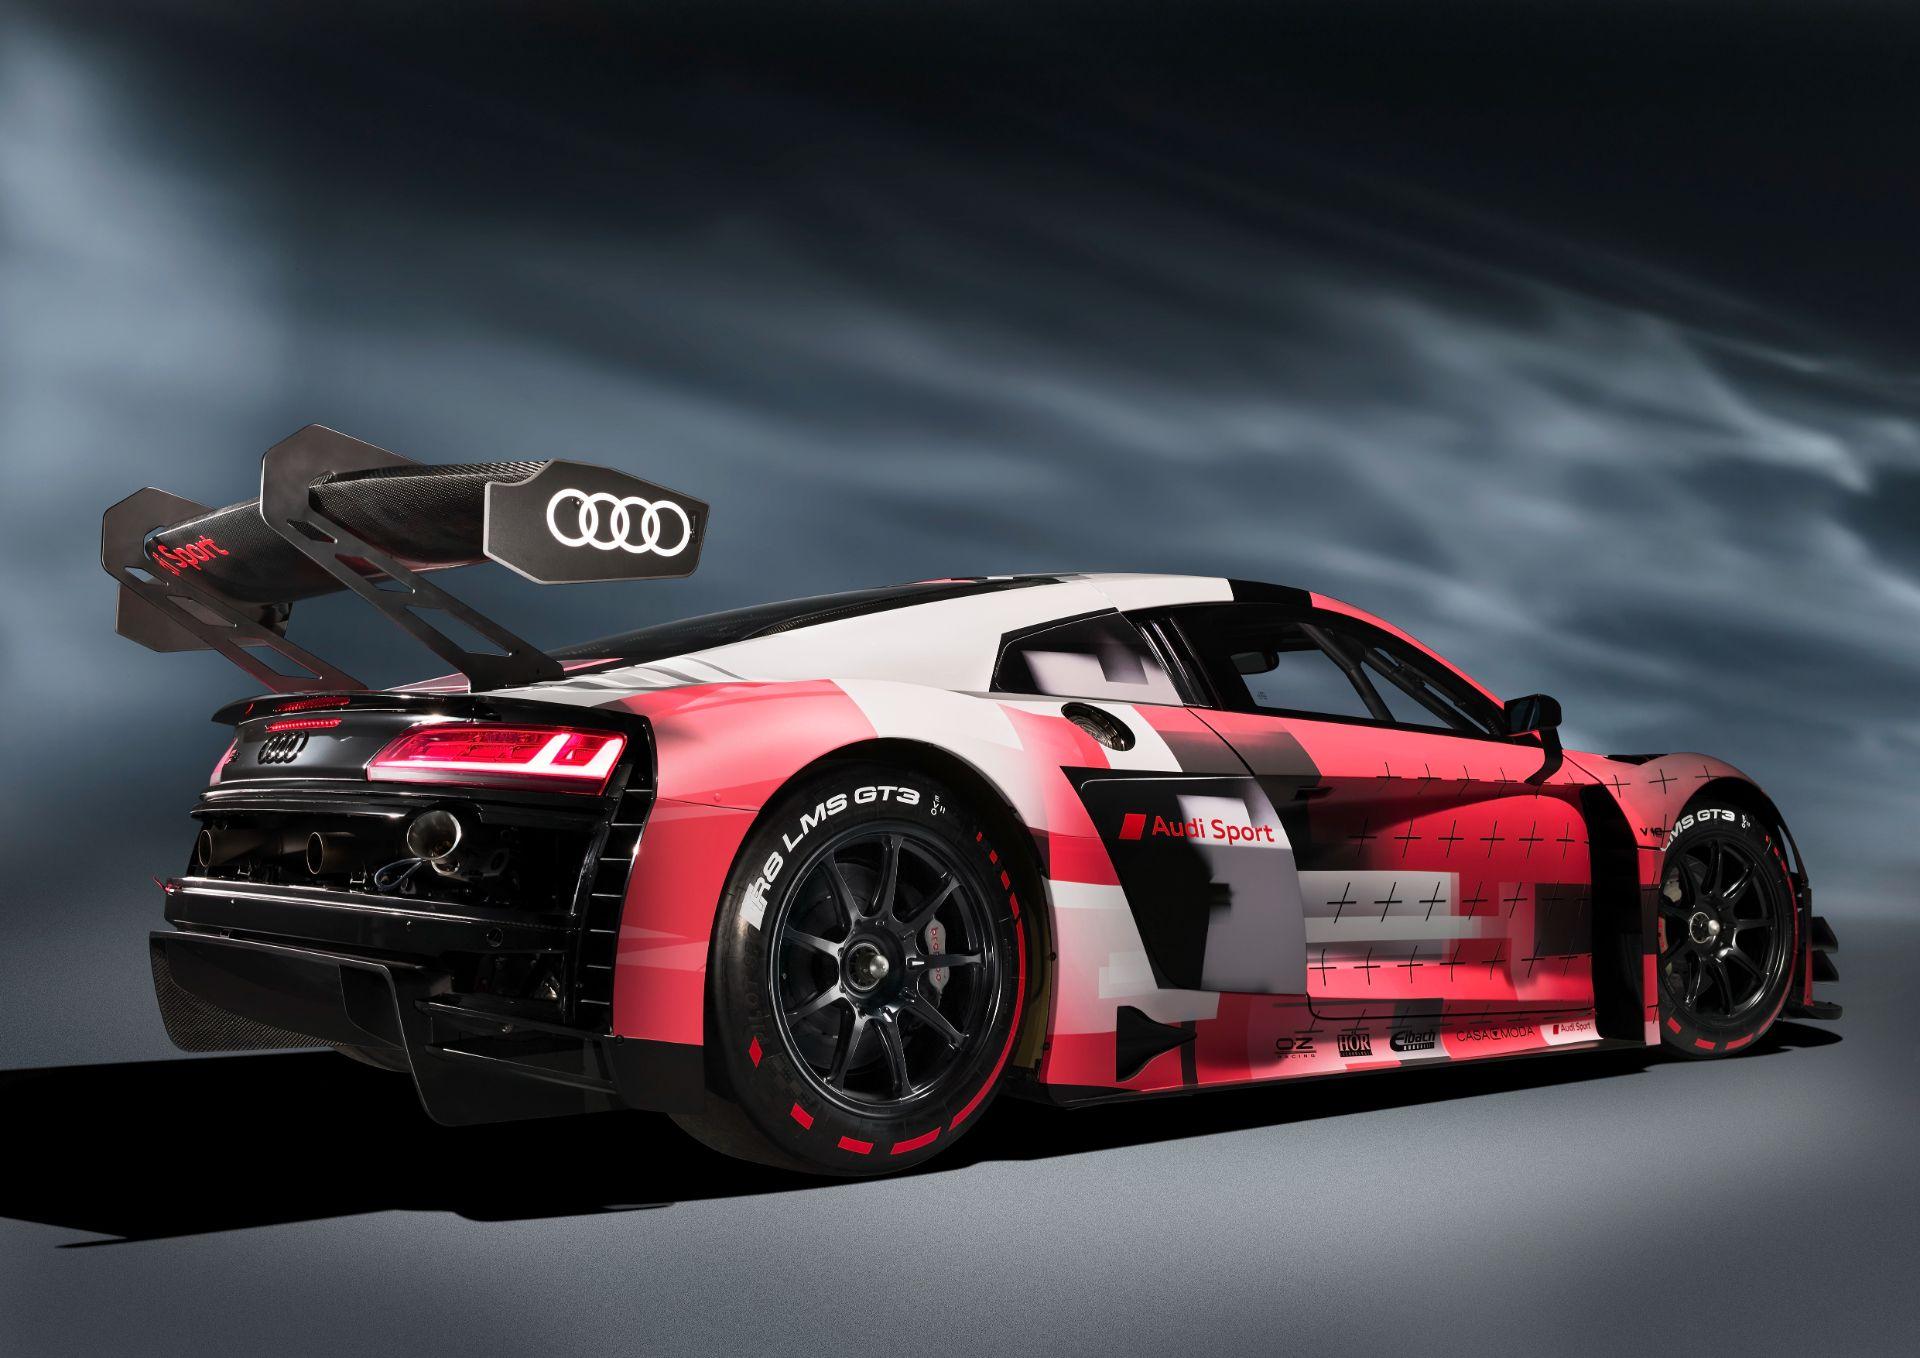 Audi-R8-LMS-GT3-Evo-II-3